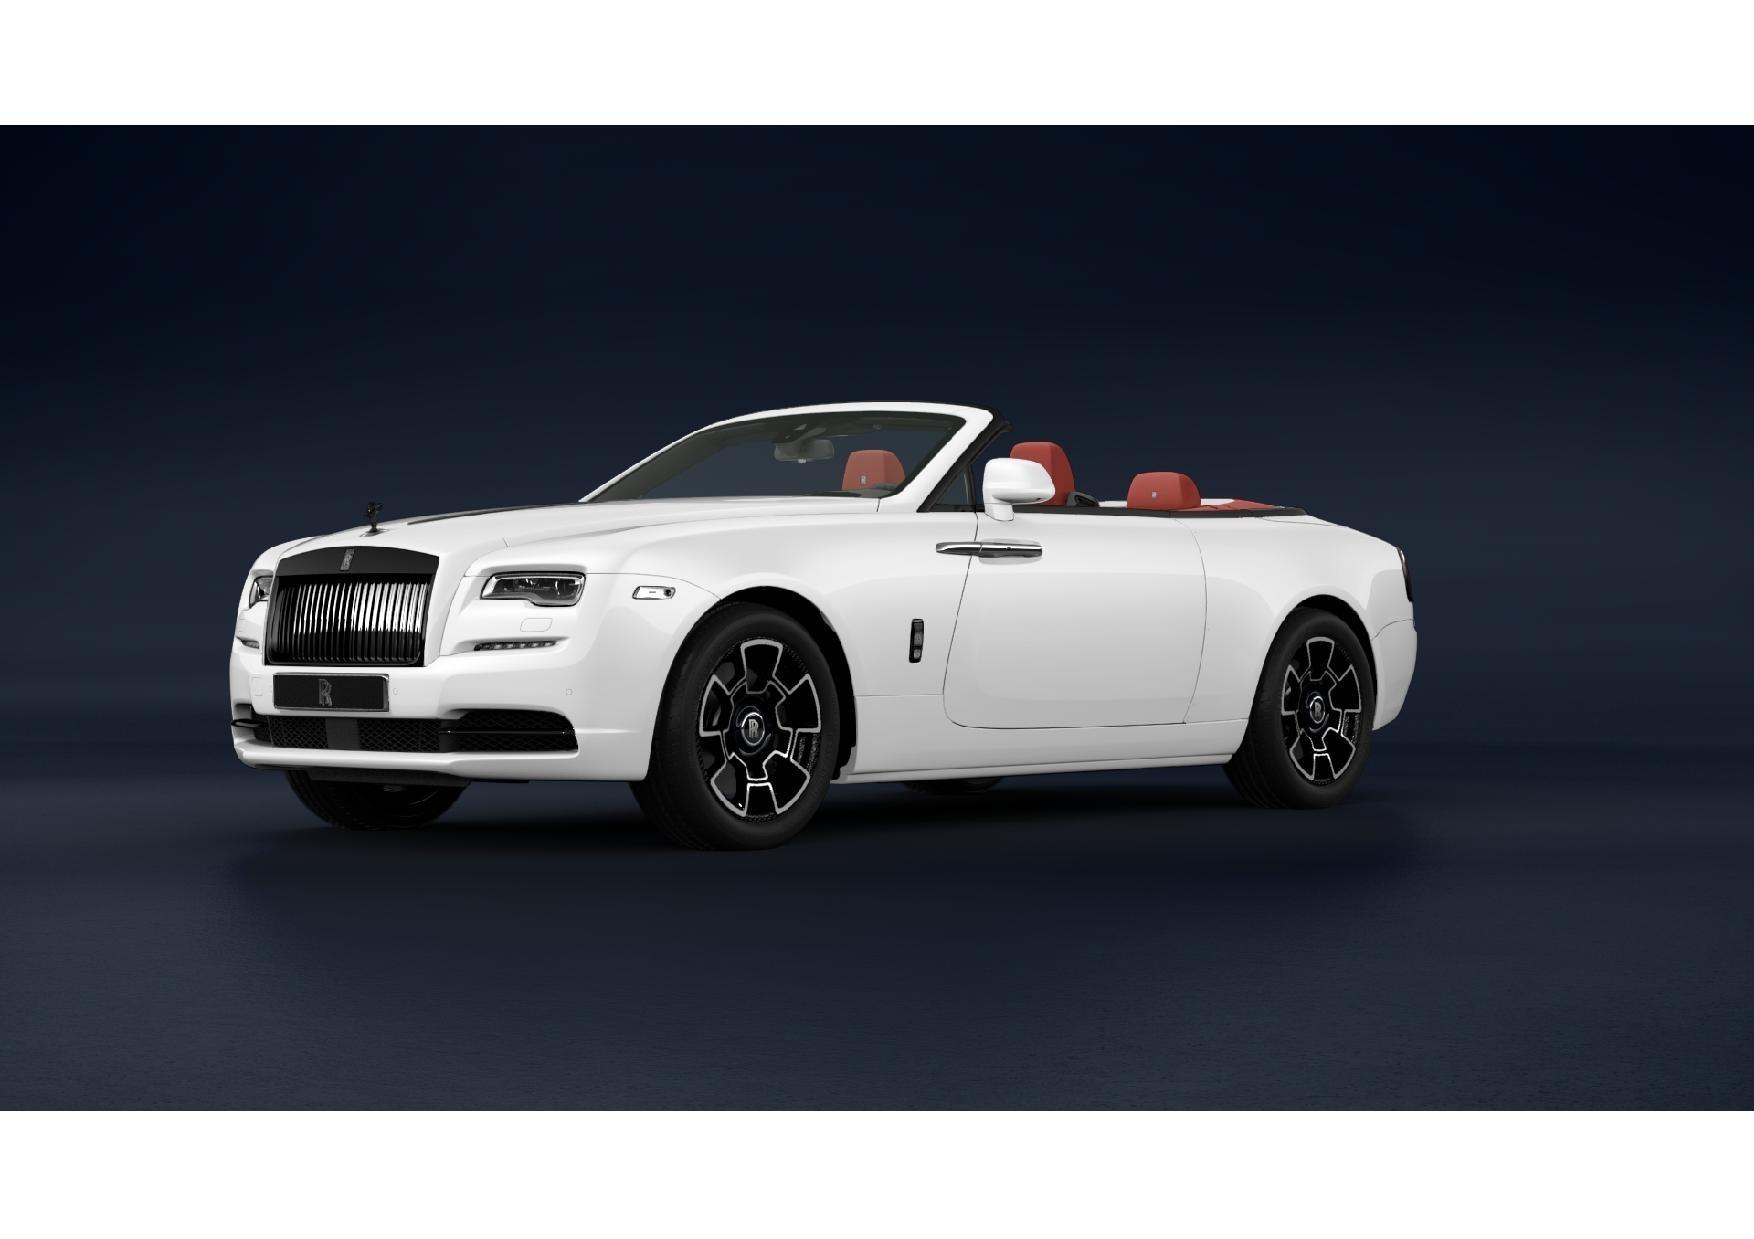 New 2021 Rolls-Royce Dawn Black Badge for sale Sold at Bugatti of Greenwich in Greenwich CT 06830 1